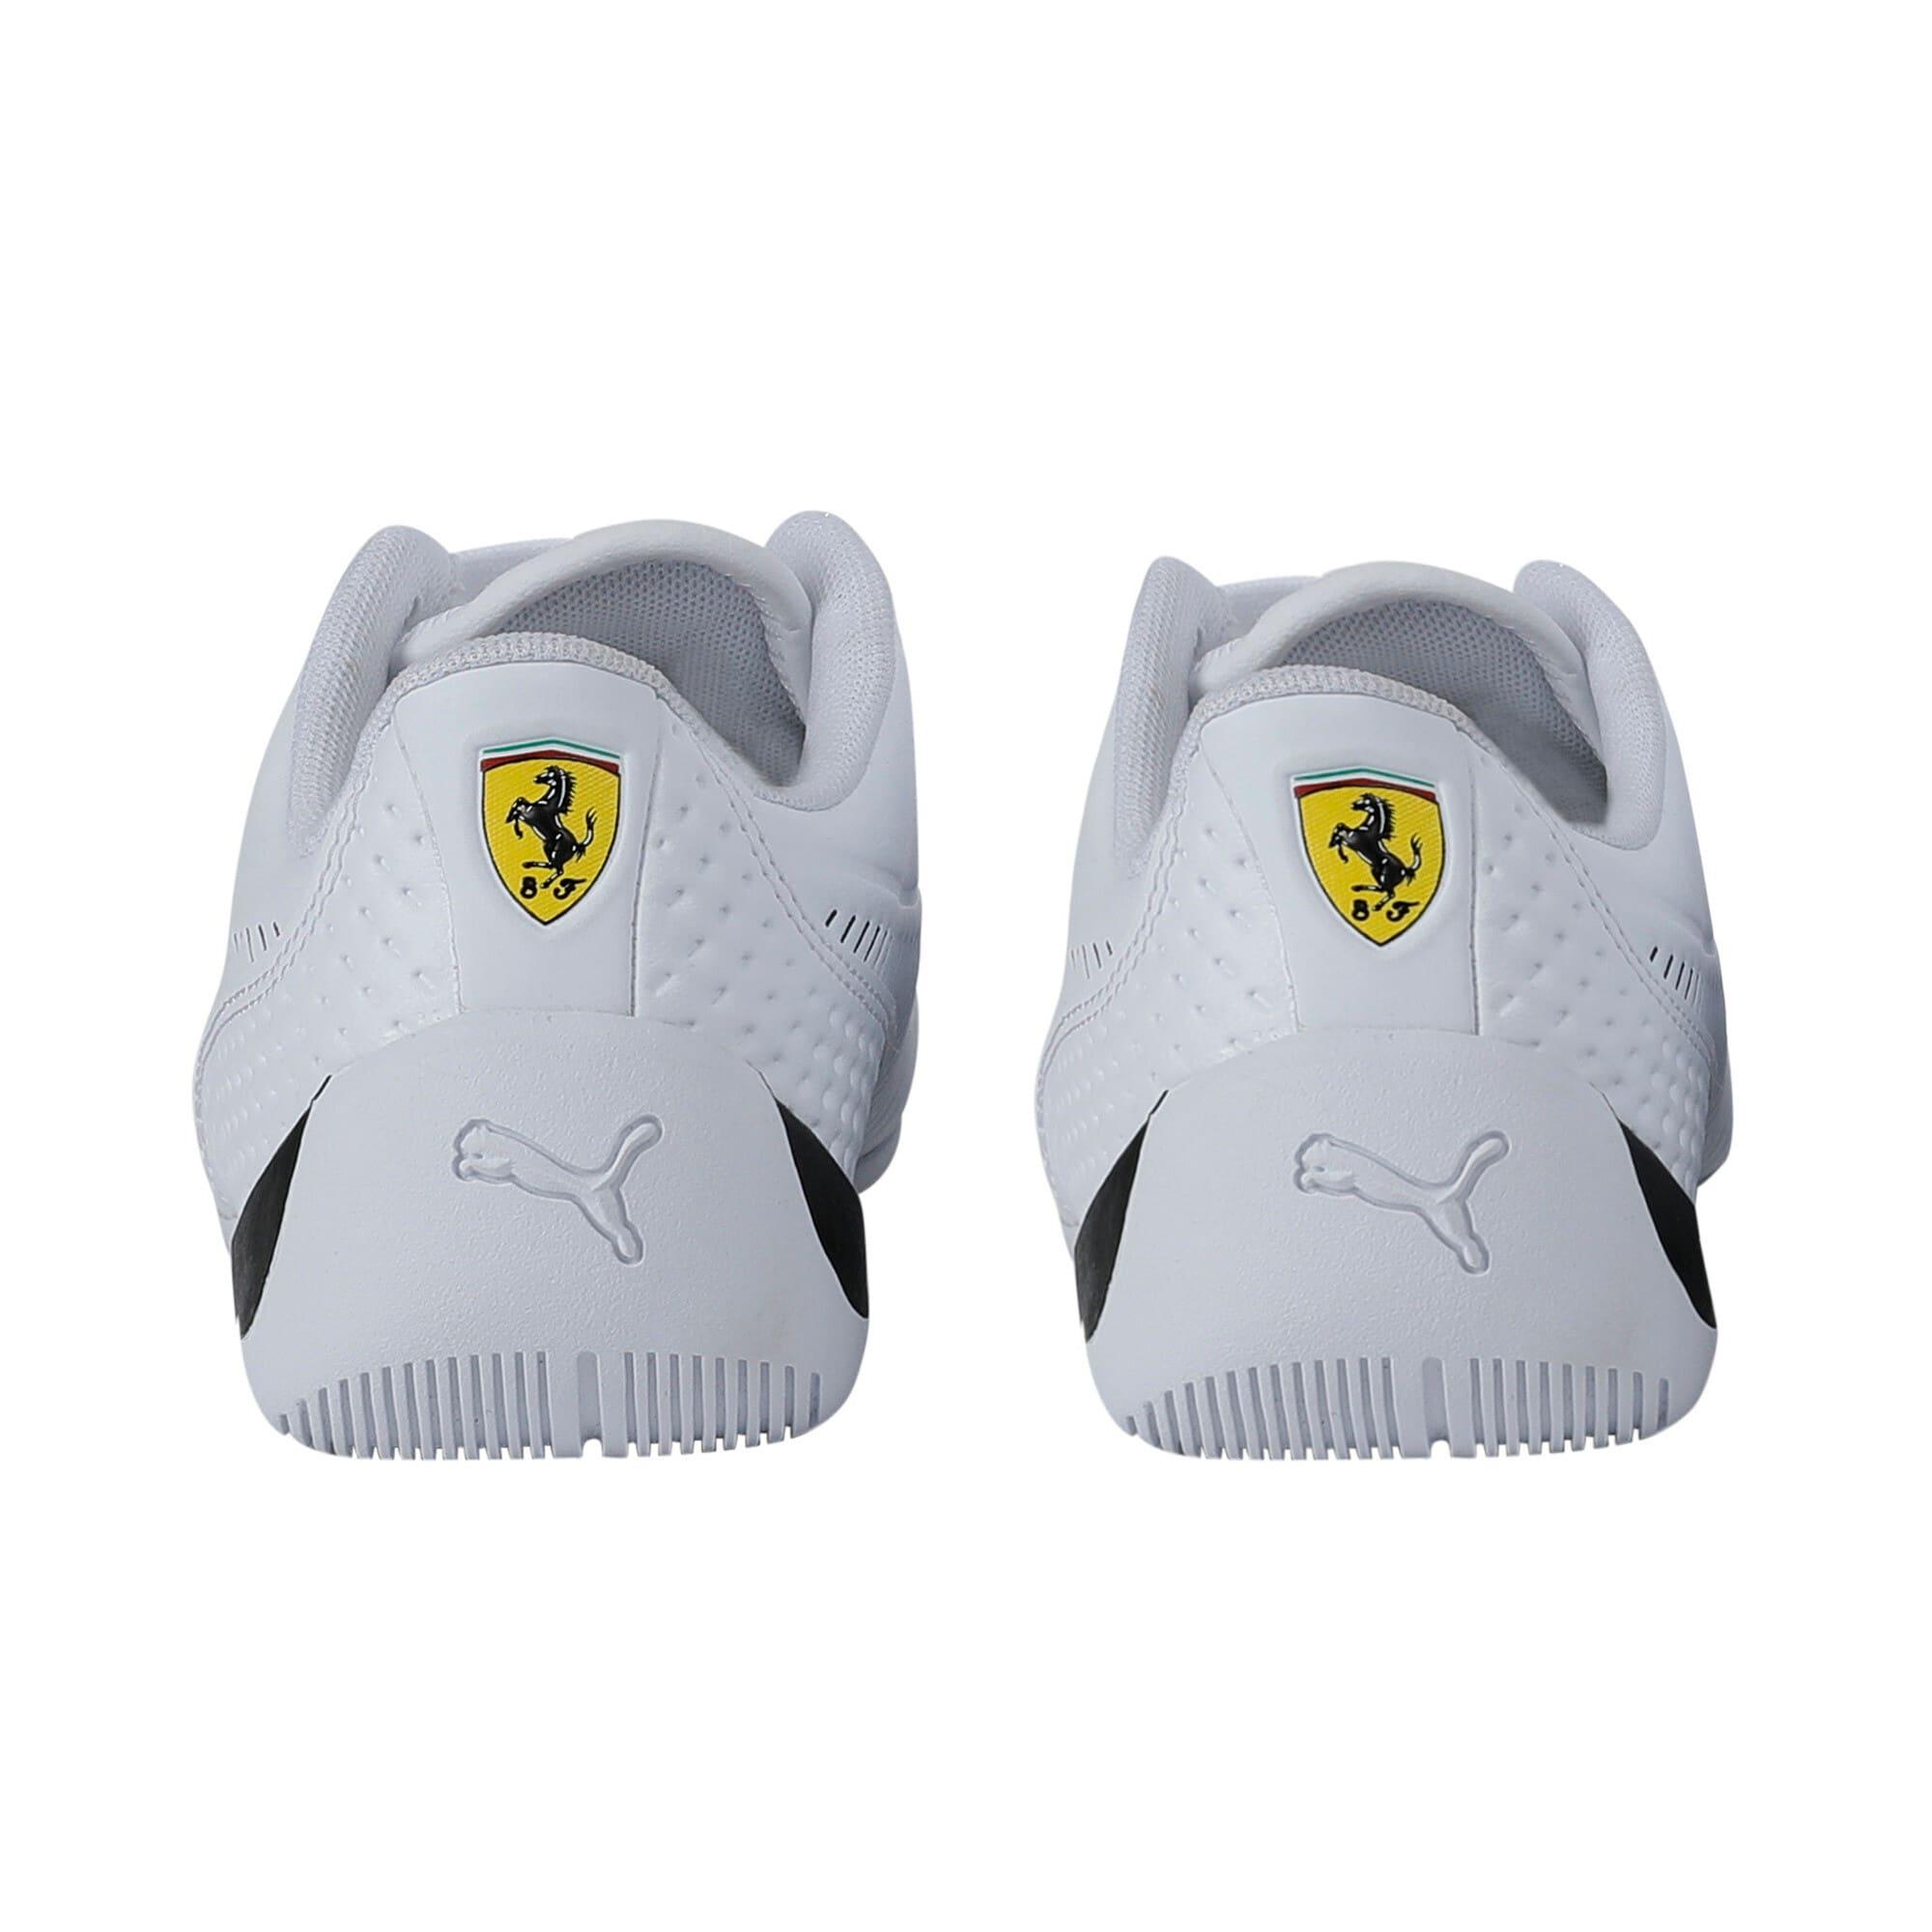 Thumbnail 3 of Ferrari Drift Cat 7S Ultra Youth Trainers, Puma White-Puma Black, medium-IND